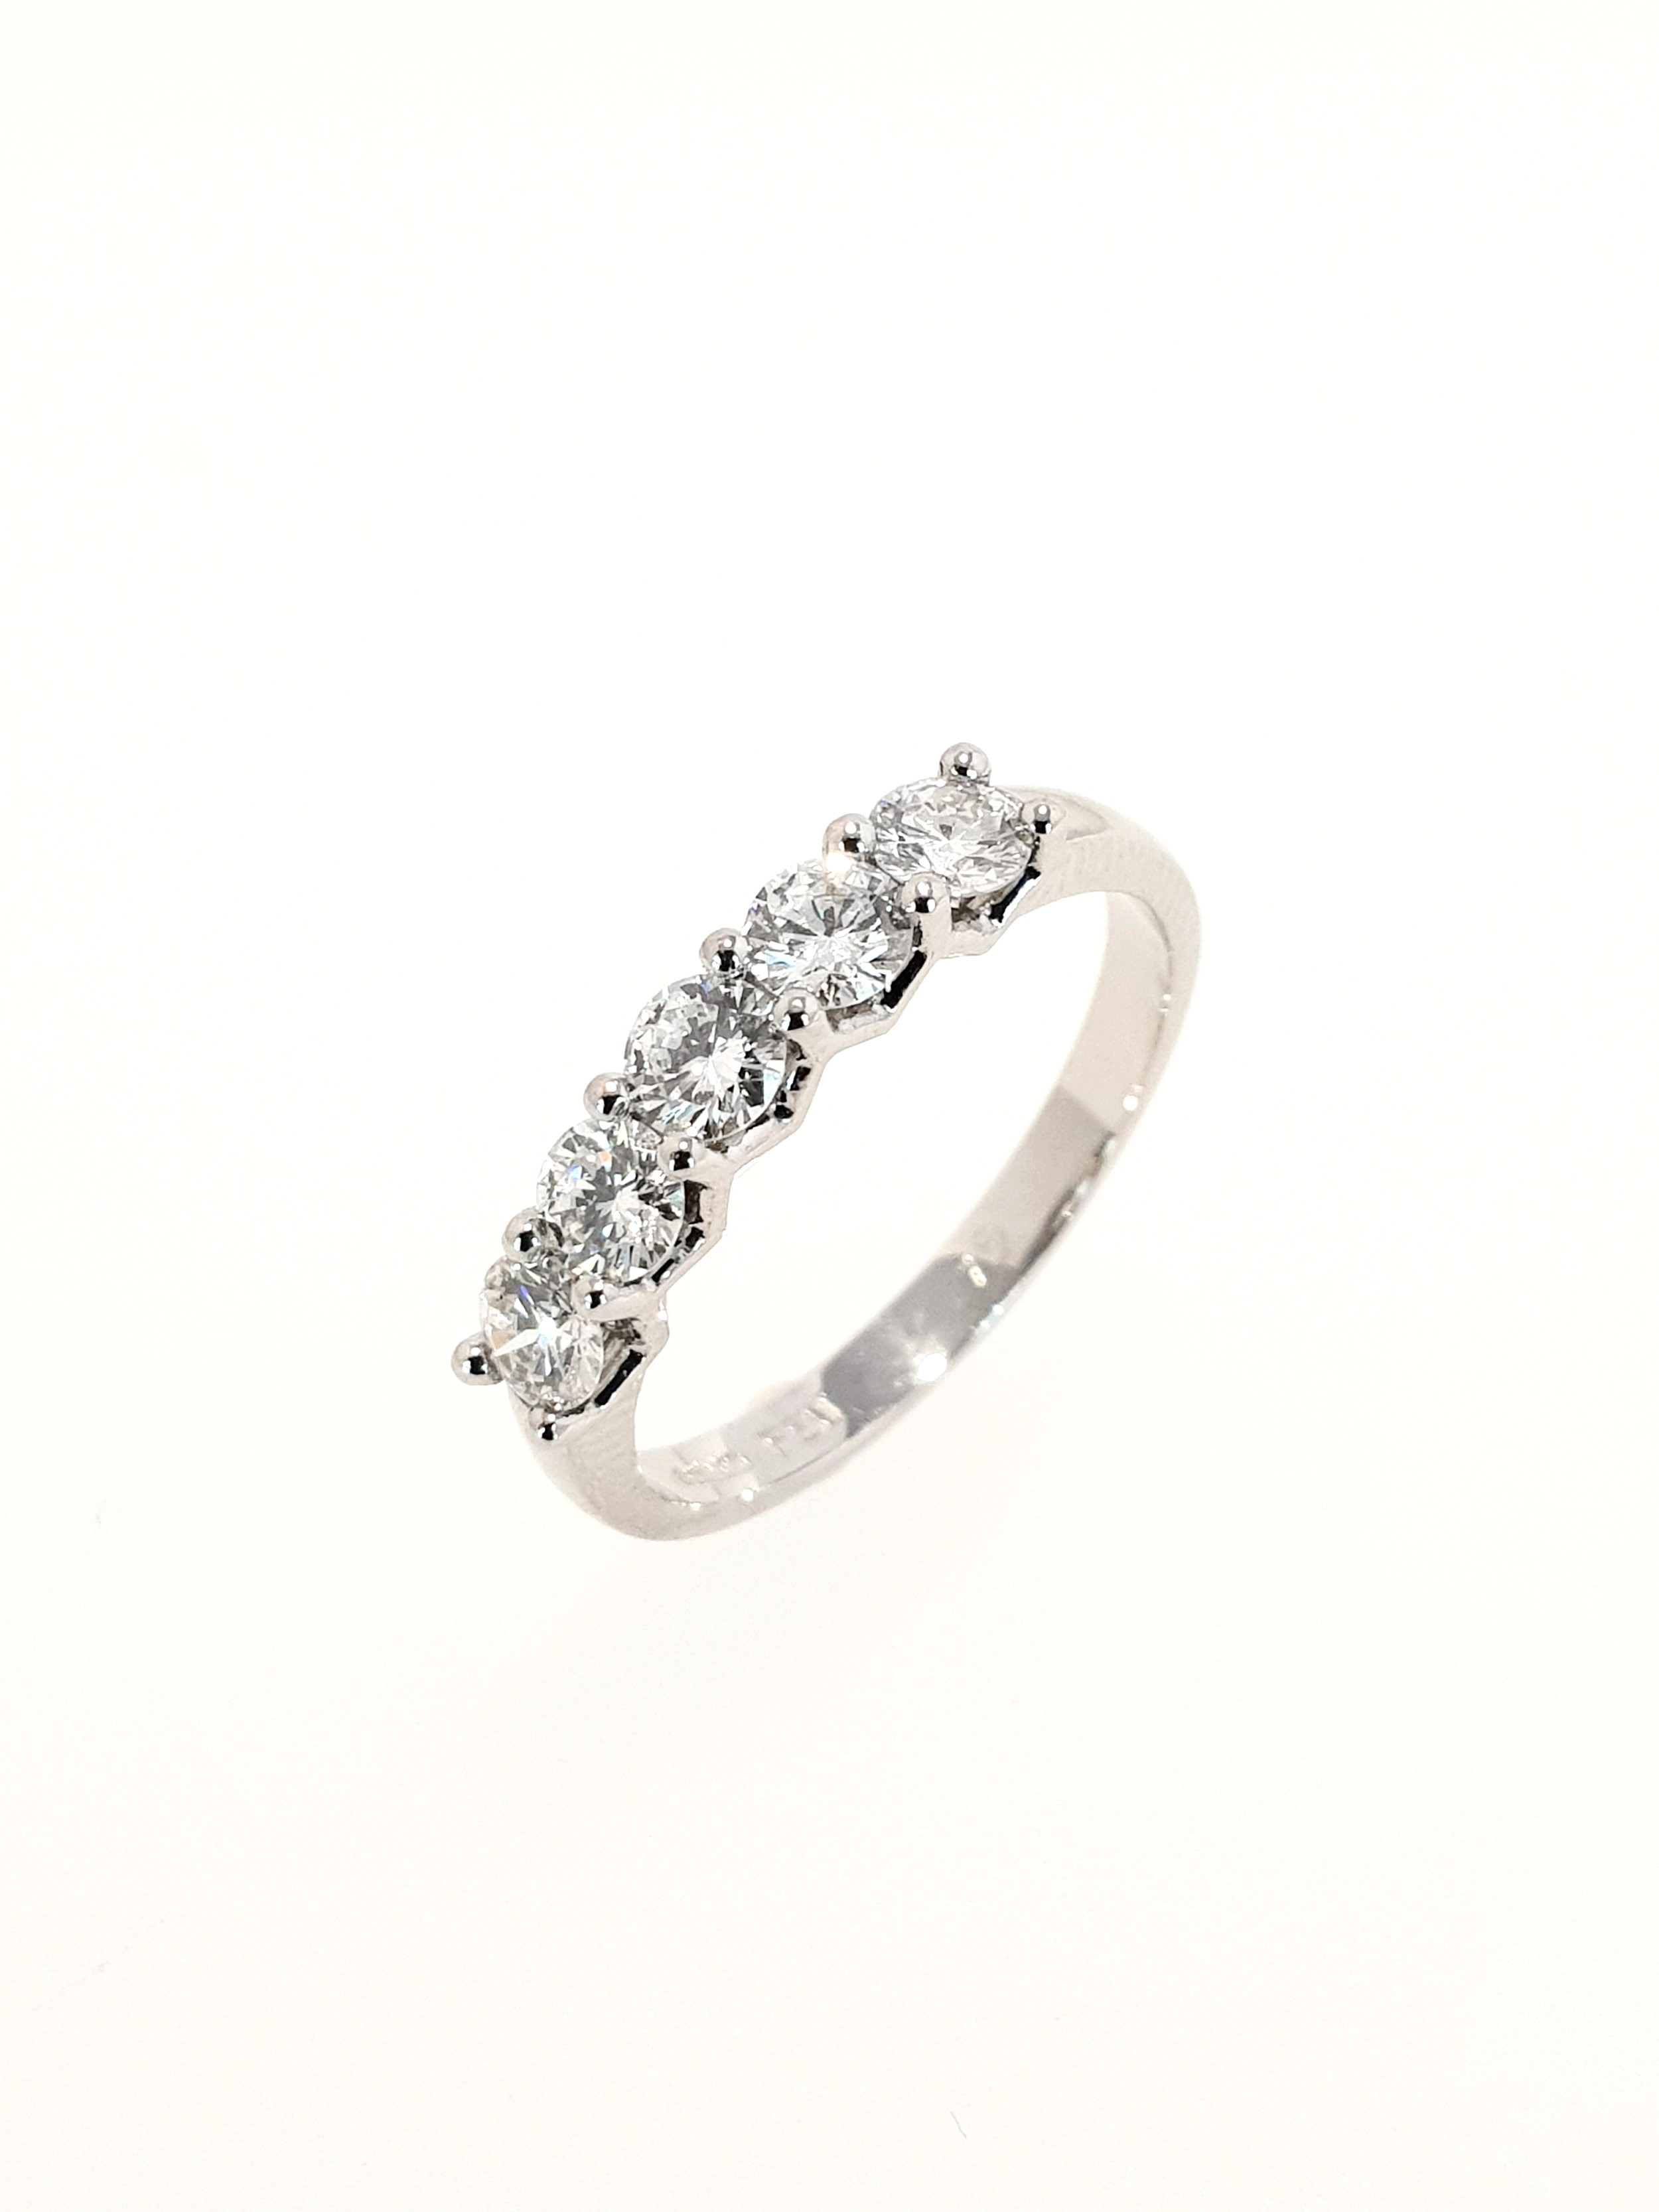 Platinum 5 Stone Eternity Ring  .75ct, H, SI1  Stock Code: N8935  £2500